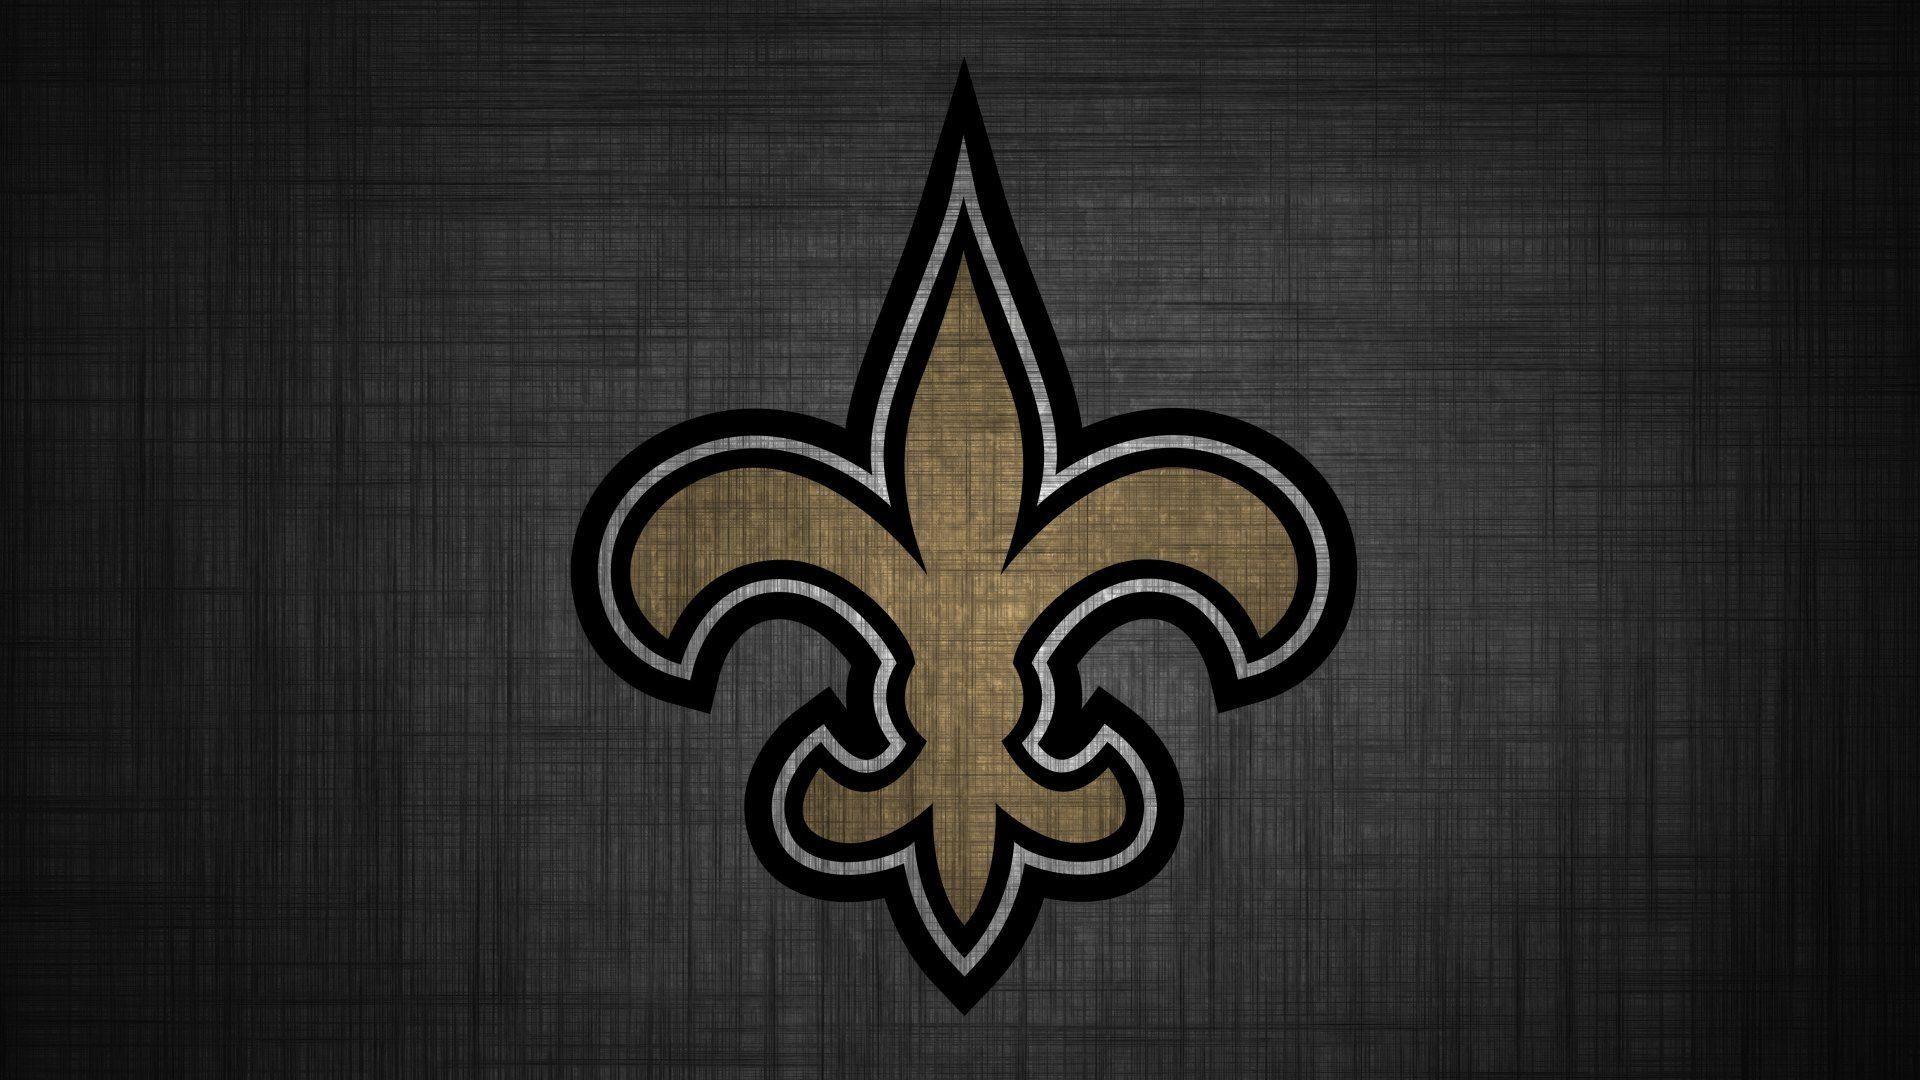 10 New New Orleans Saints Wallpaper FULL HD 1080p For PC Desktop 1920x1080